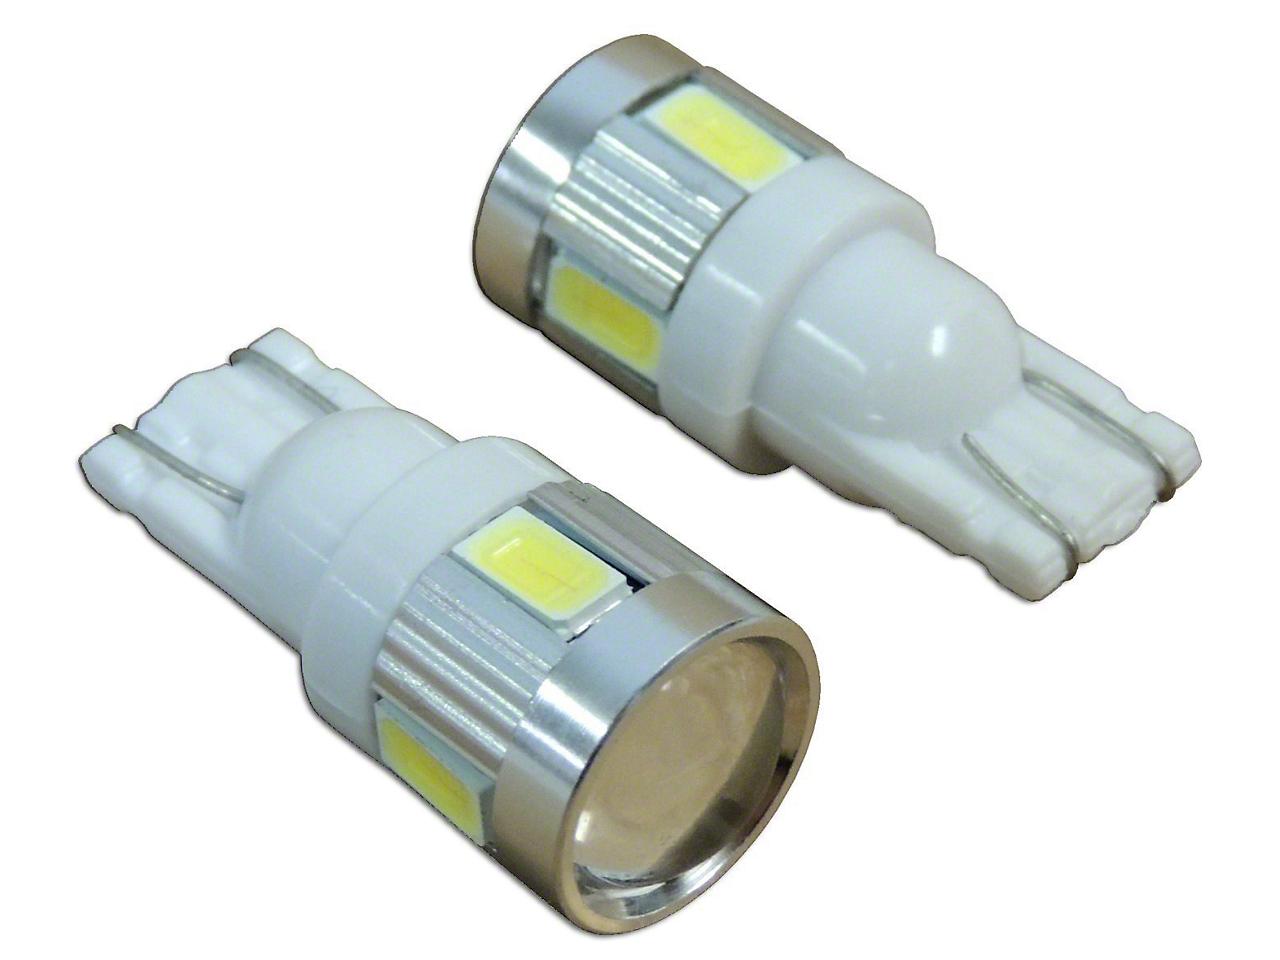 RT Off-Road Front Side Marker Light LED Bulbs - 194 (87-06 Jeep Wrangler YJ & TJ)